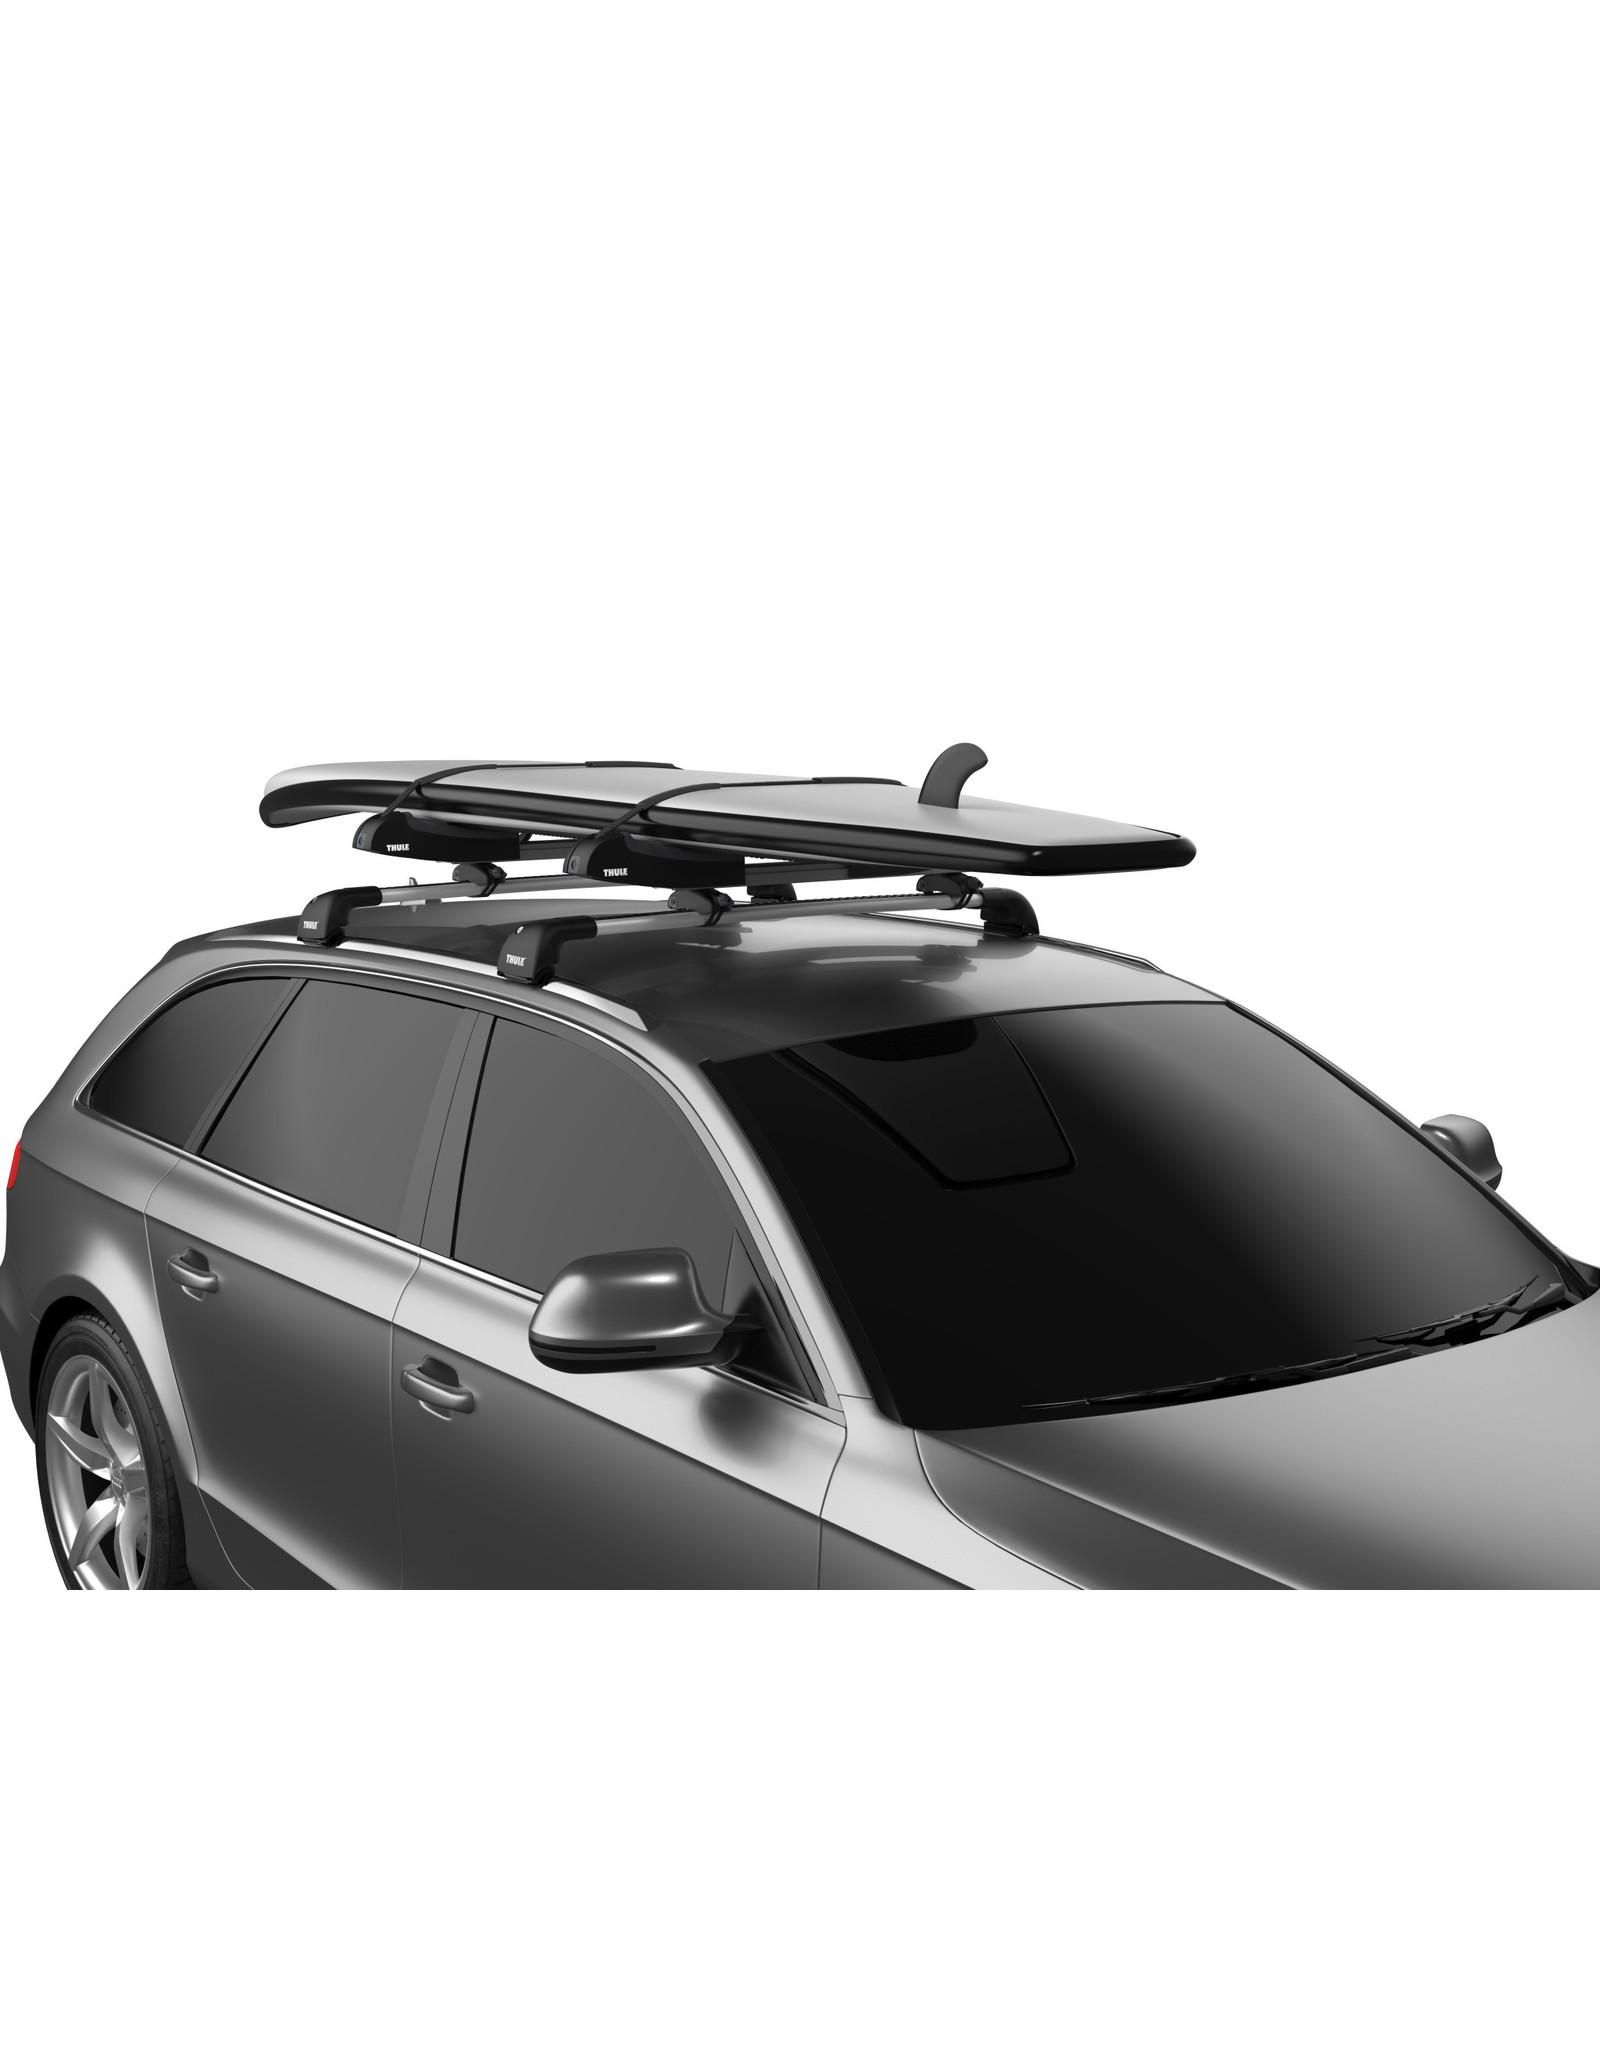 THULE SUP Taxi XT Black/Silver